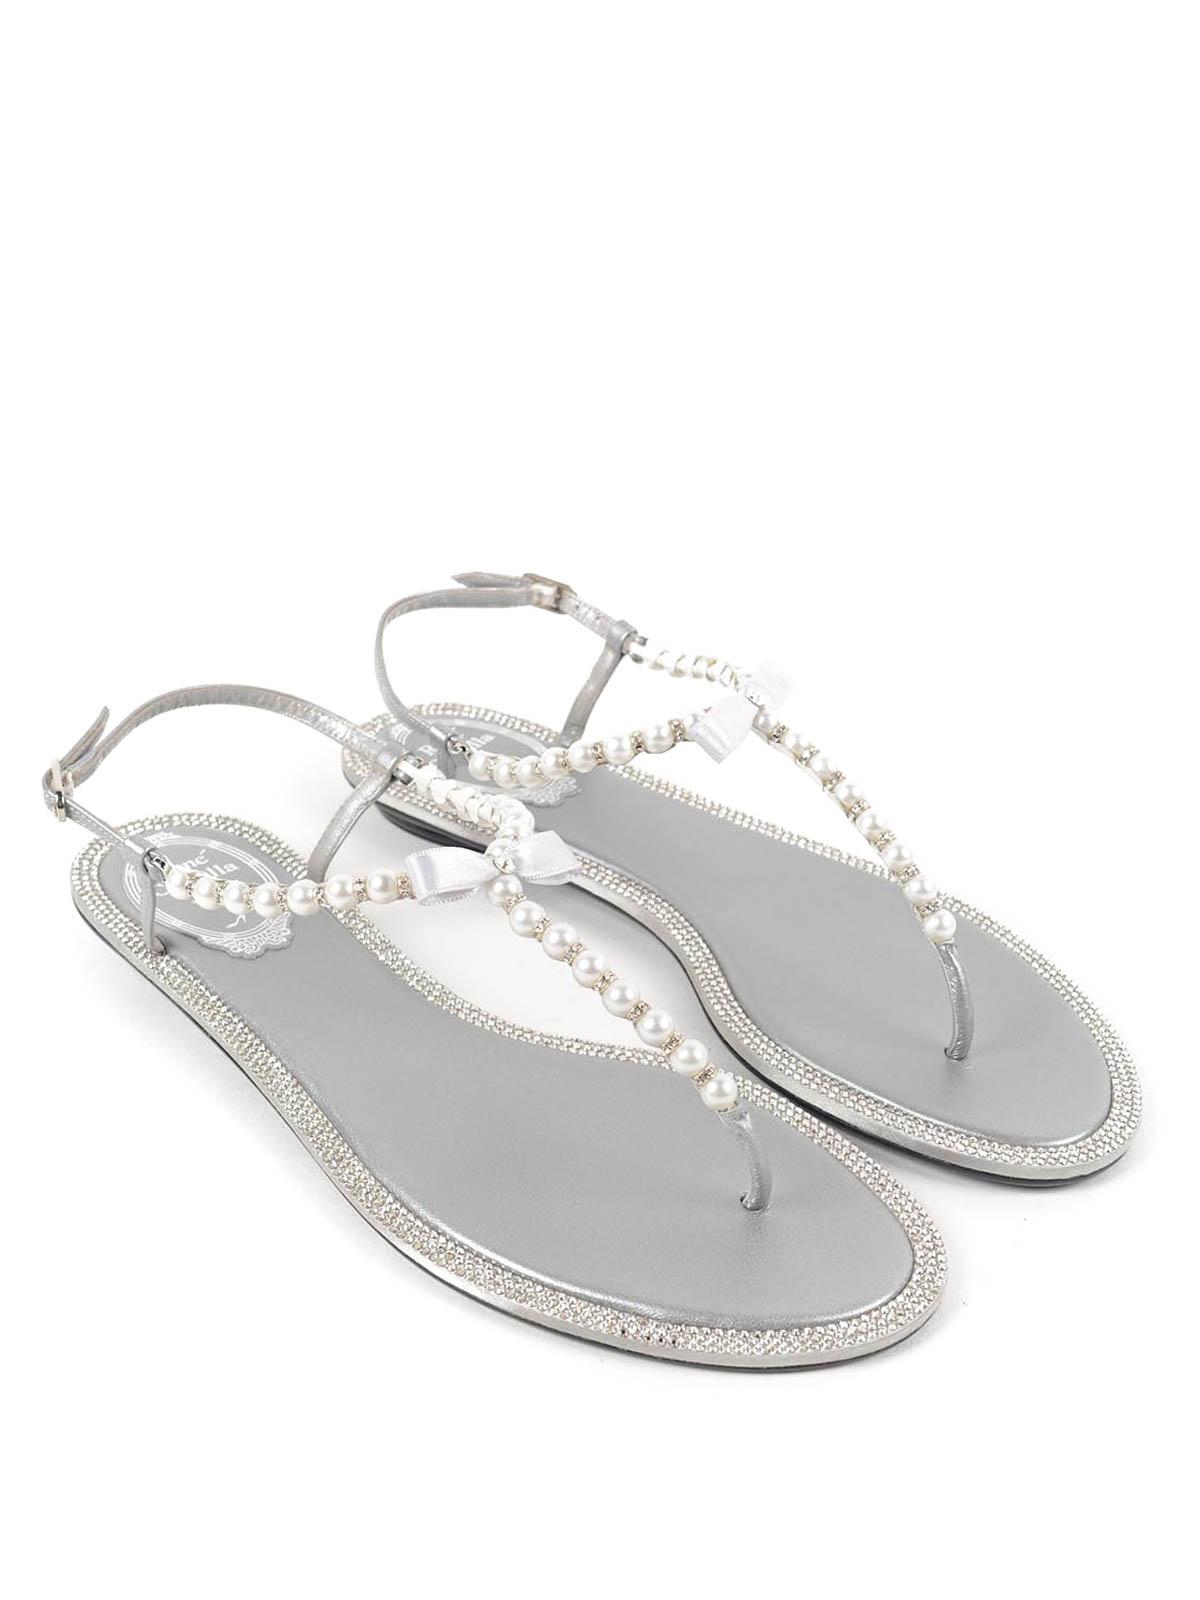 40c3813c326a Rene Caovilla - Pearl and rhinestone sandals - sandals - C07598 GREY